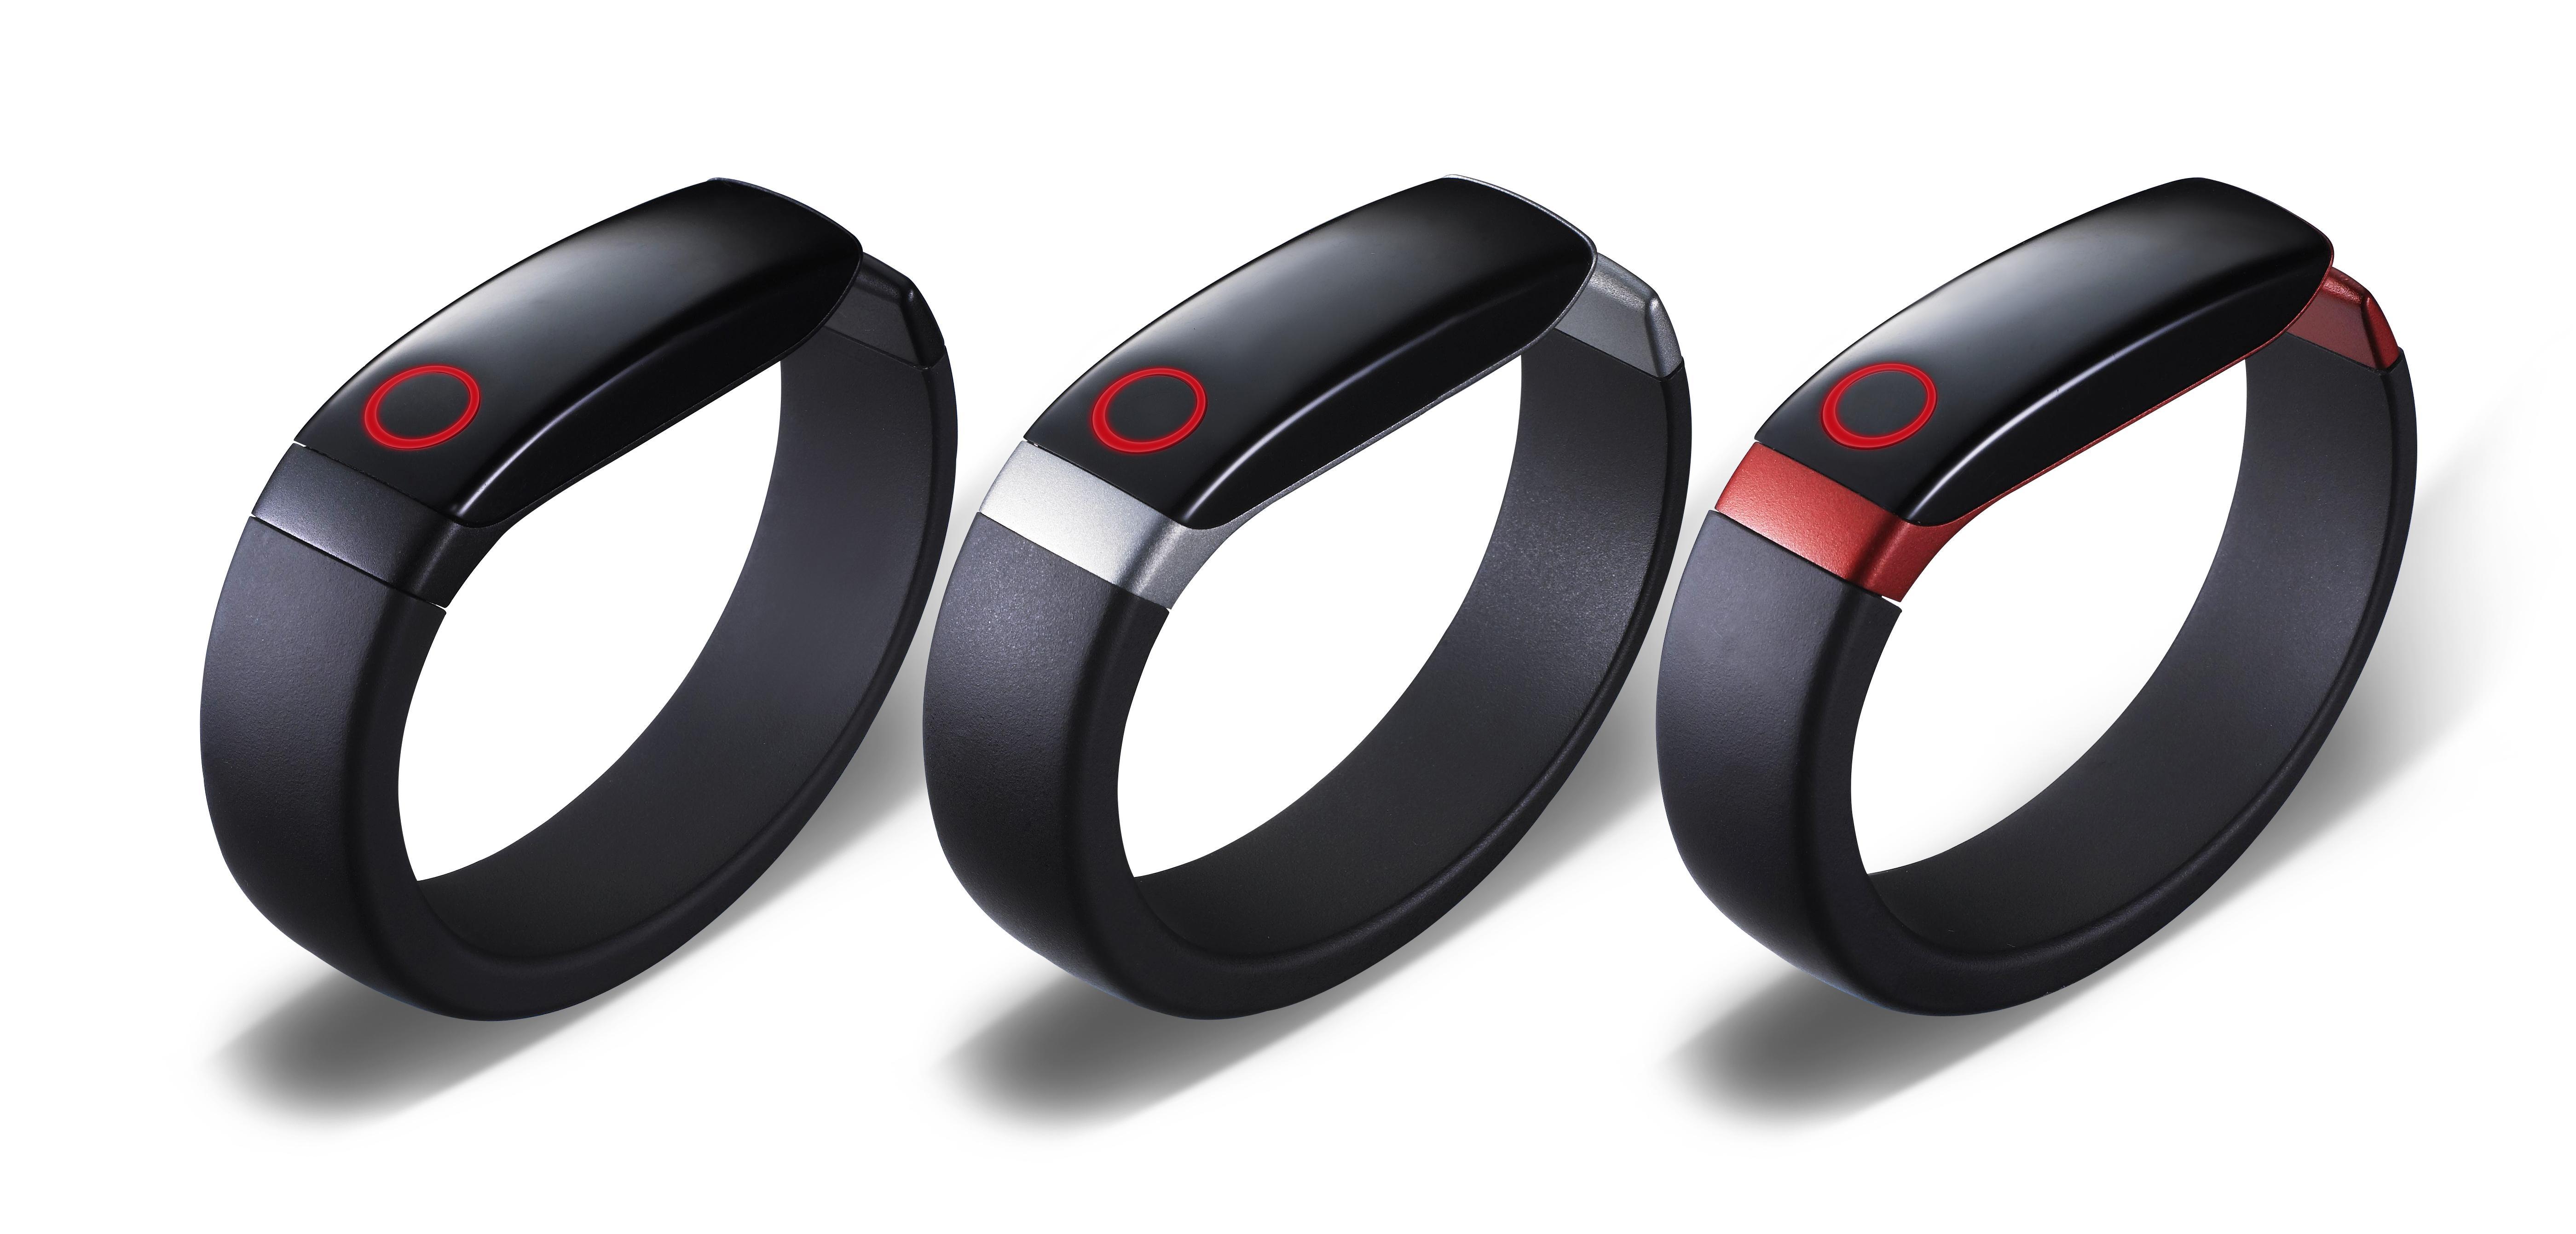 CES 2014:LG 發表 Lifeband Touch 智慧手環與心率測量耳機、WebOS 智慧電視